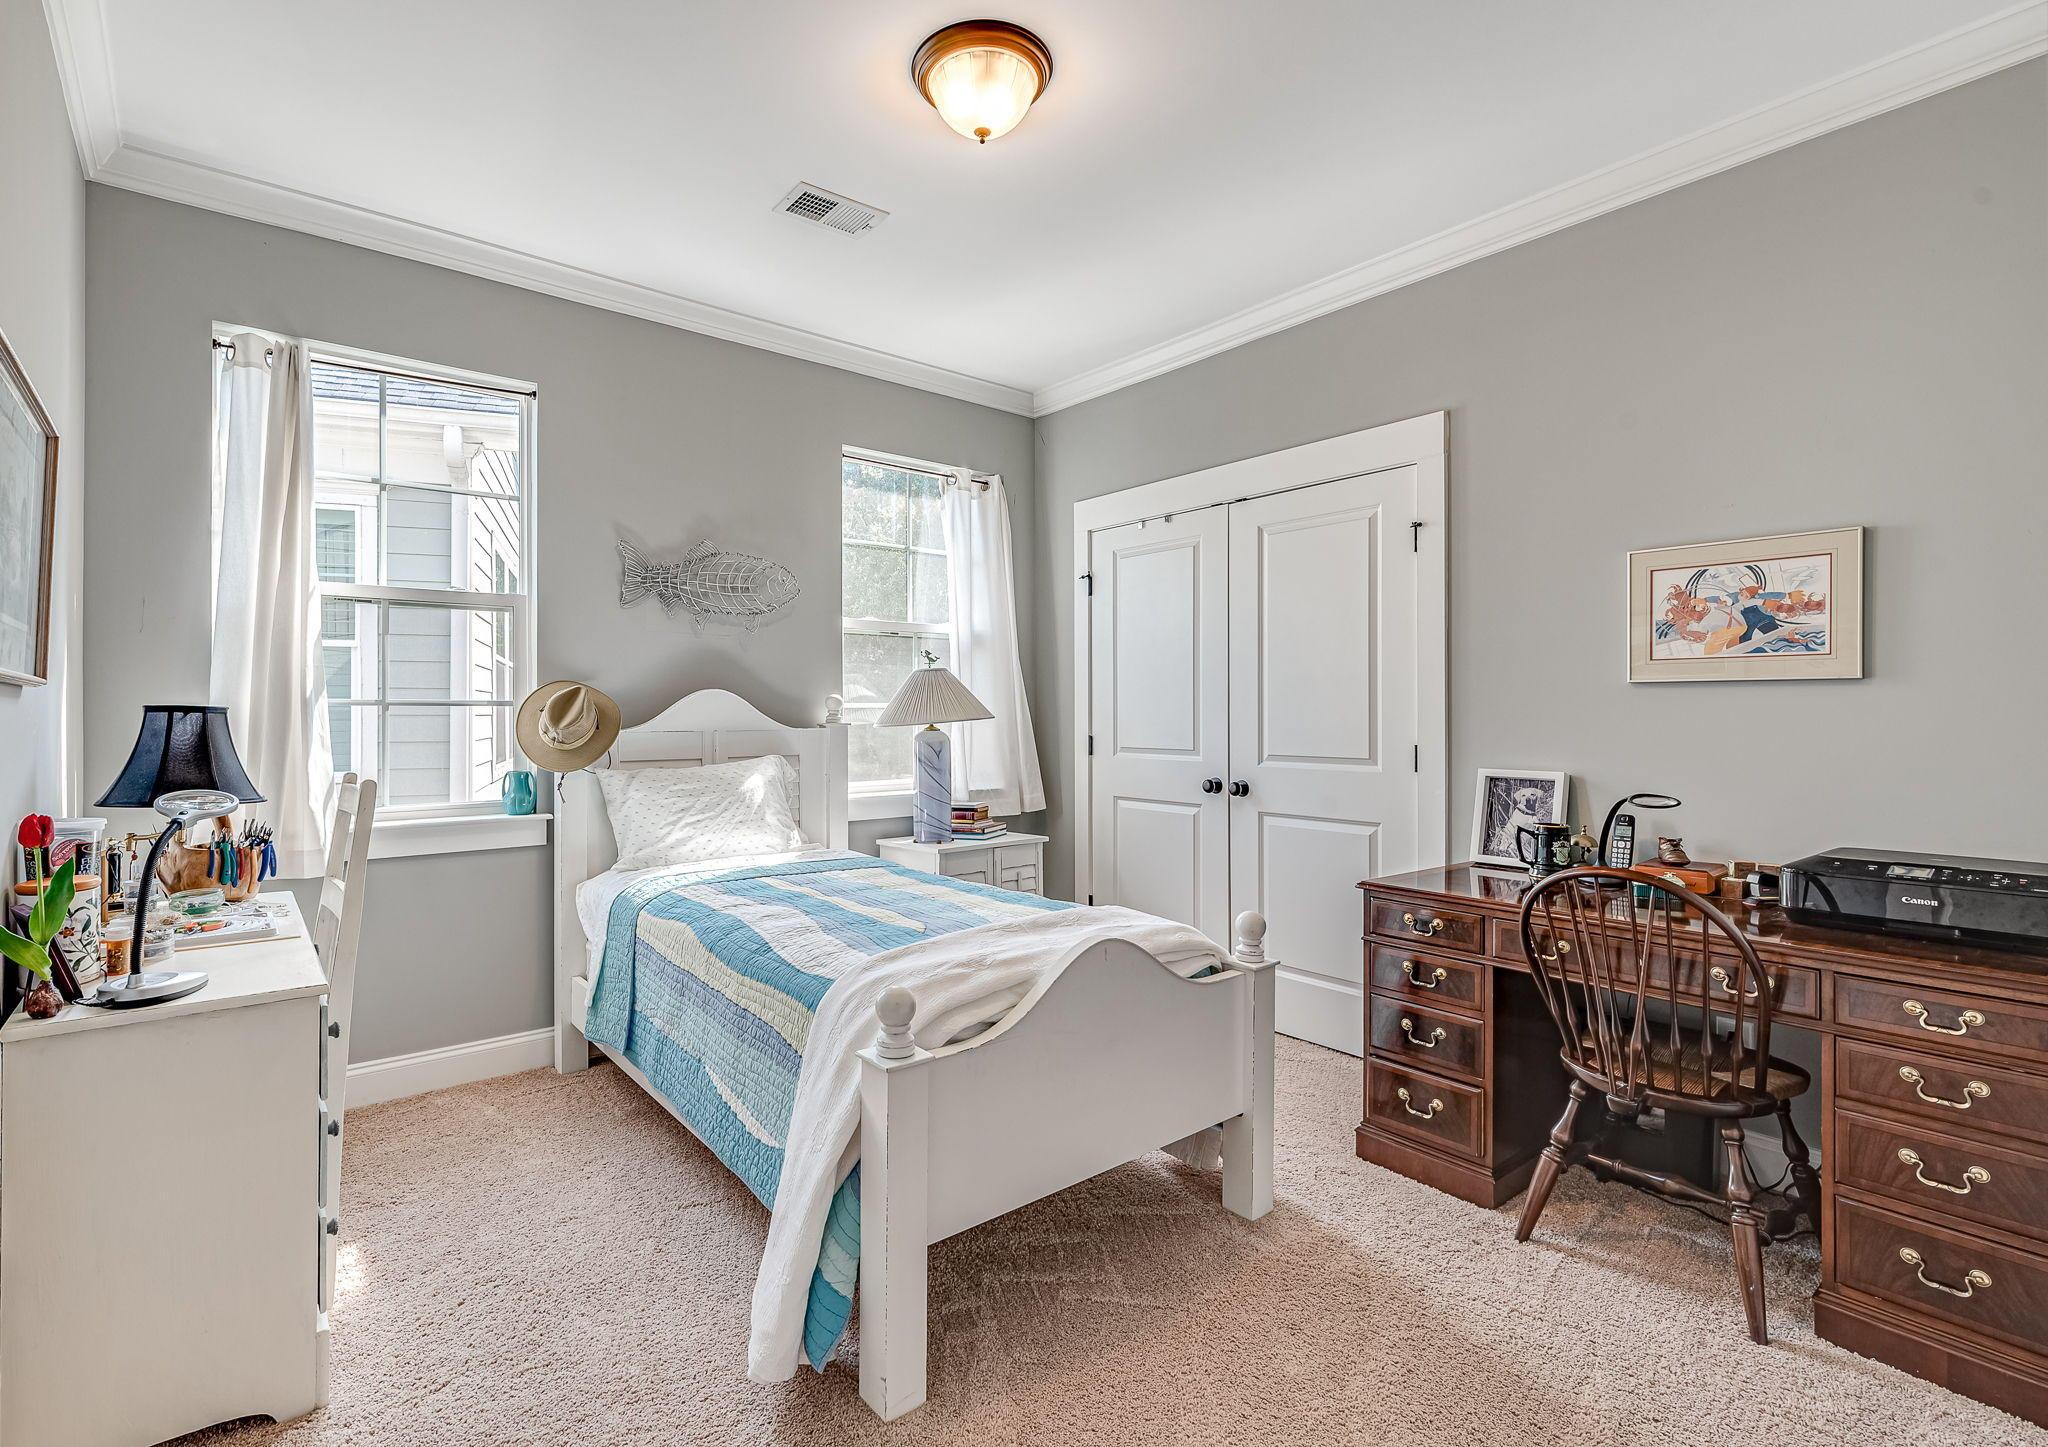 Etiwan Pointe Homes For Sale - 159 Slipper Shell, Mount Pleasant, SC - 1